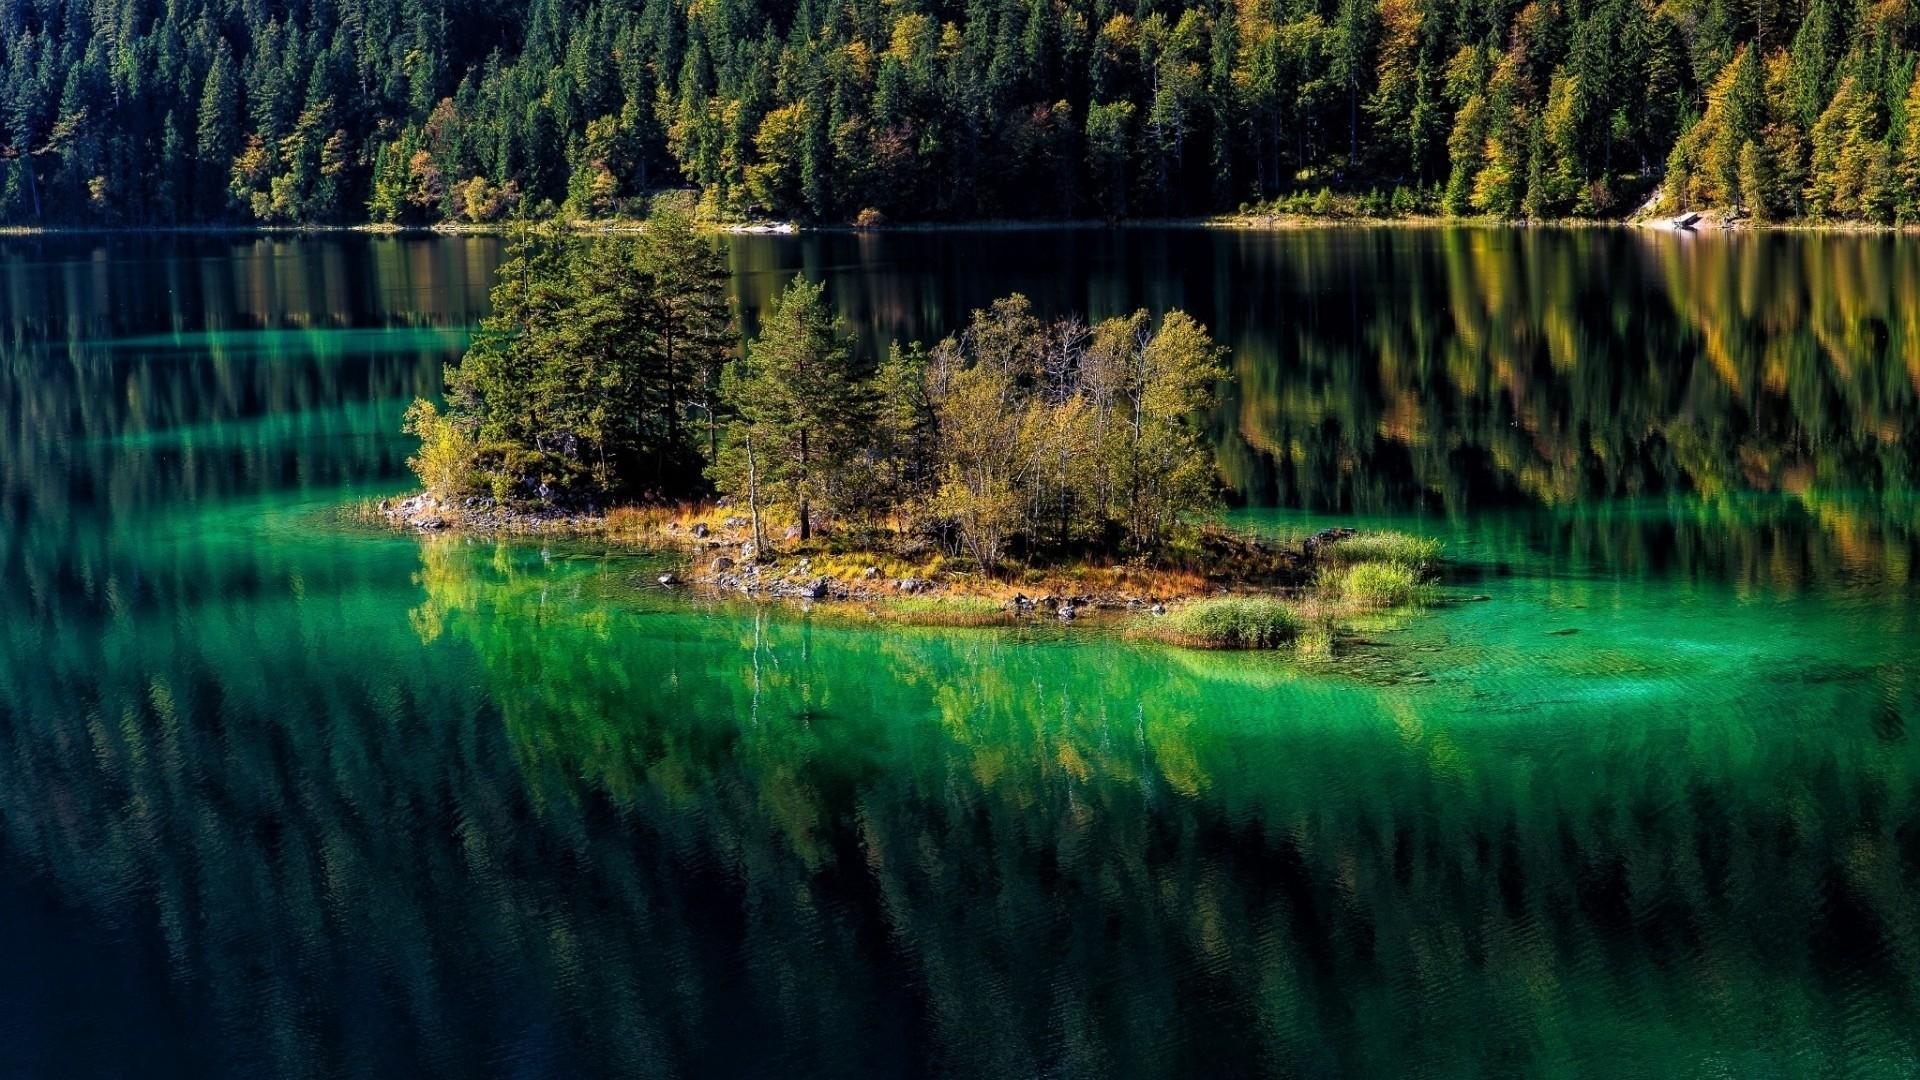 Green Water Lake HD Wallpaper | HD Wallpaper Background